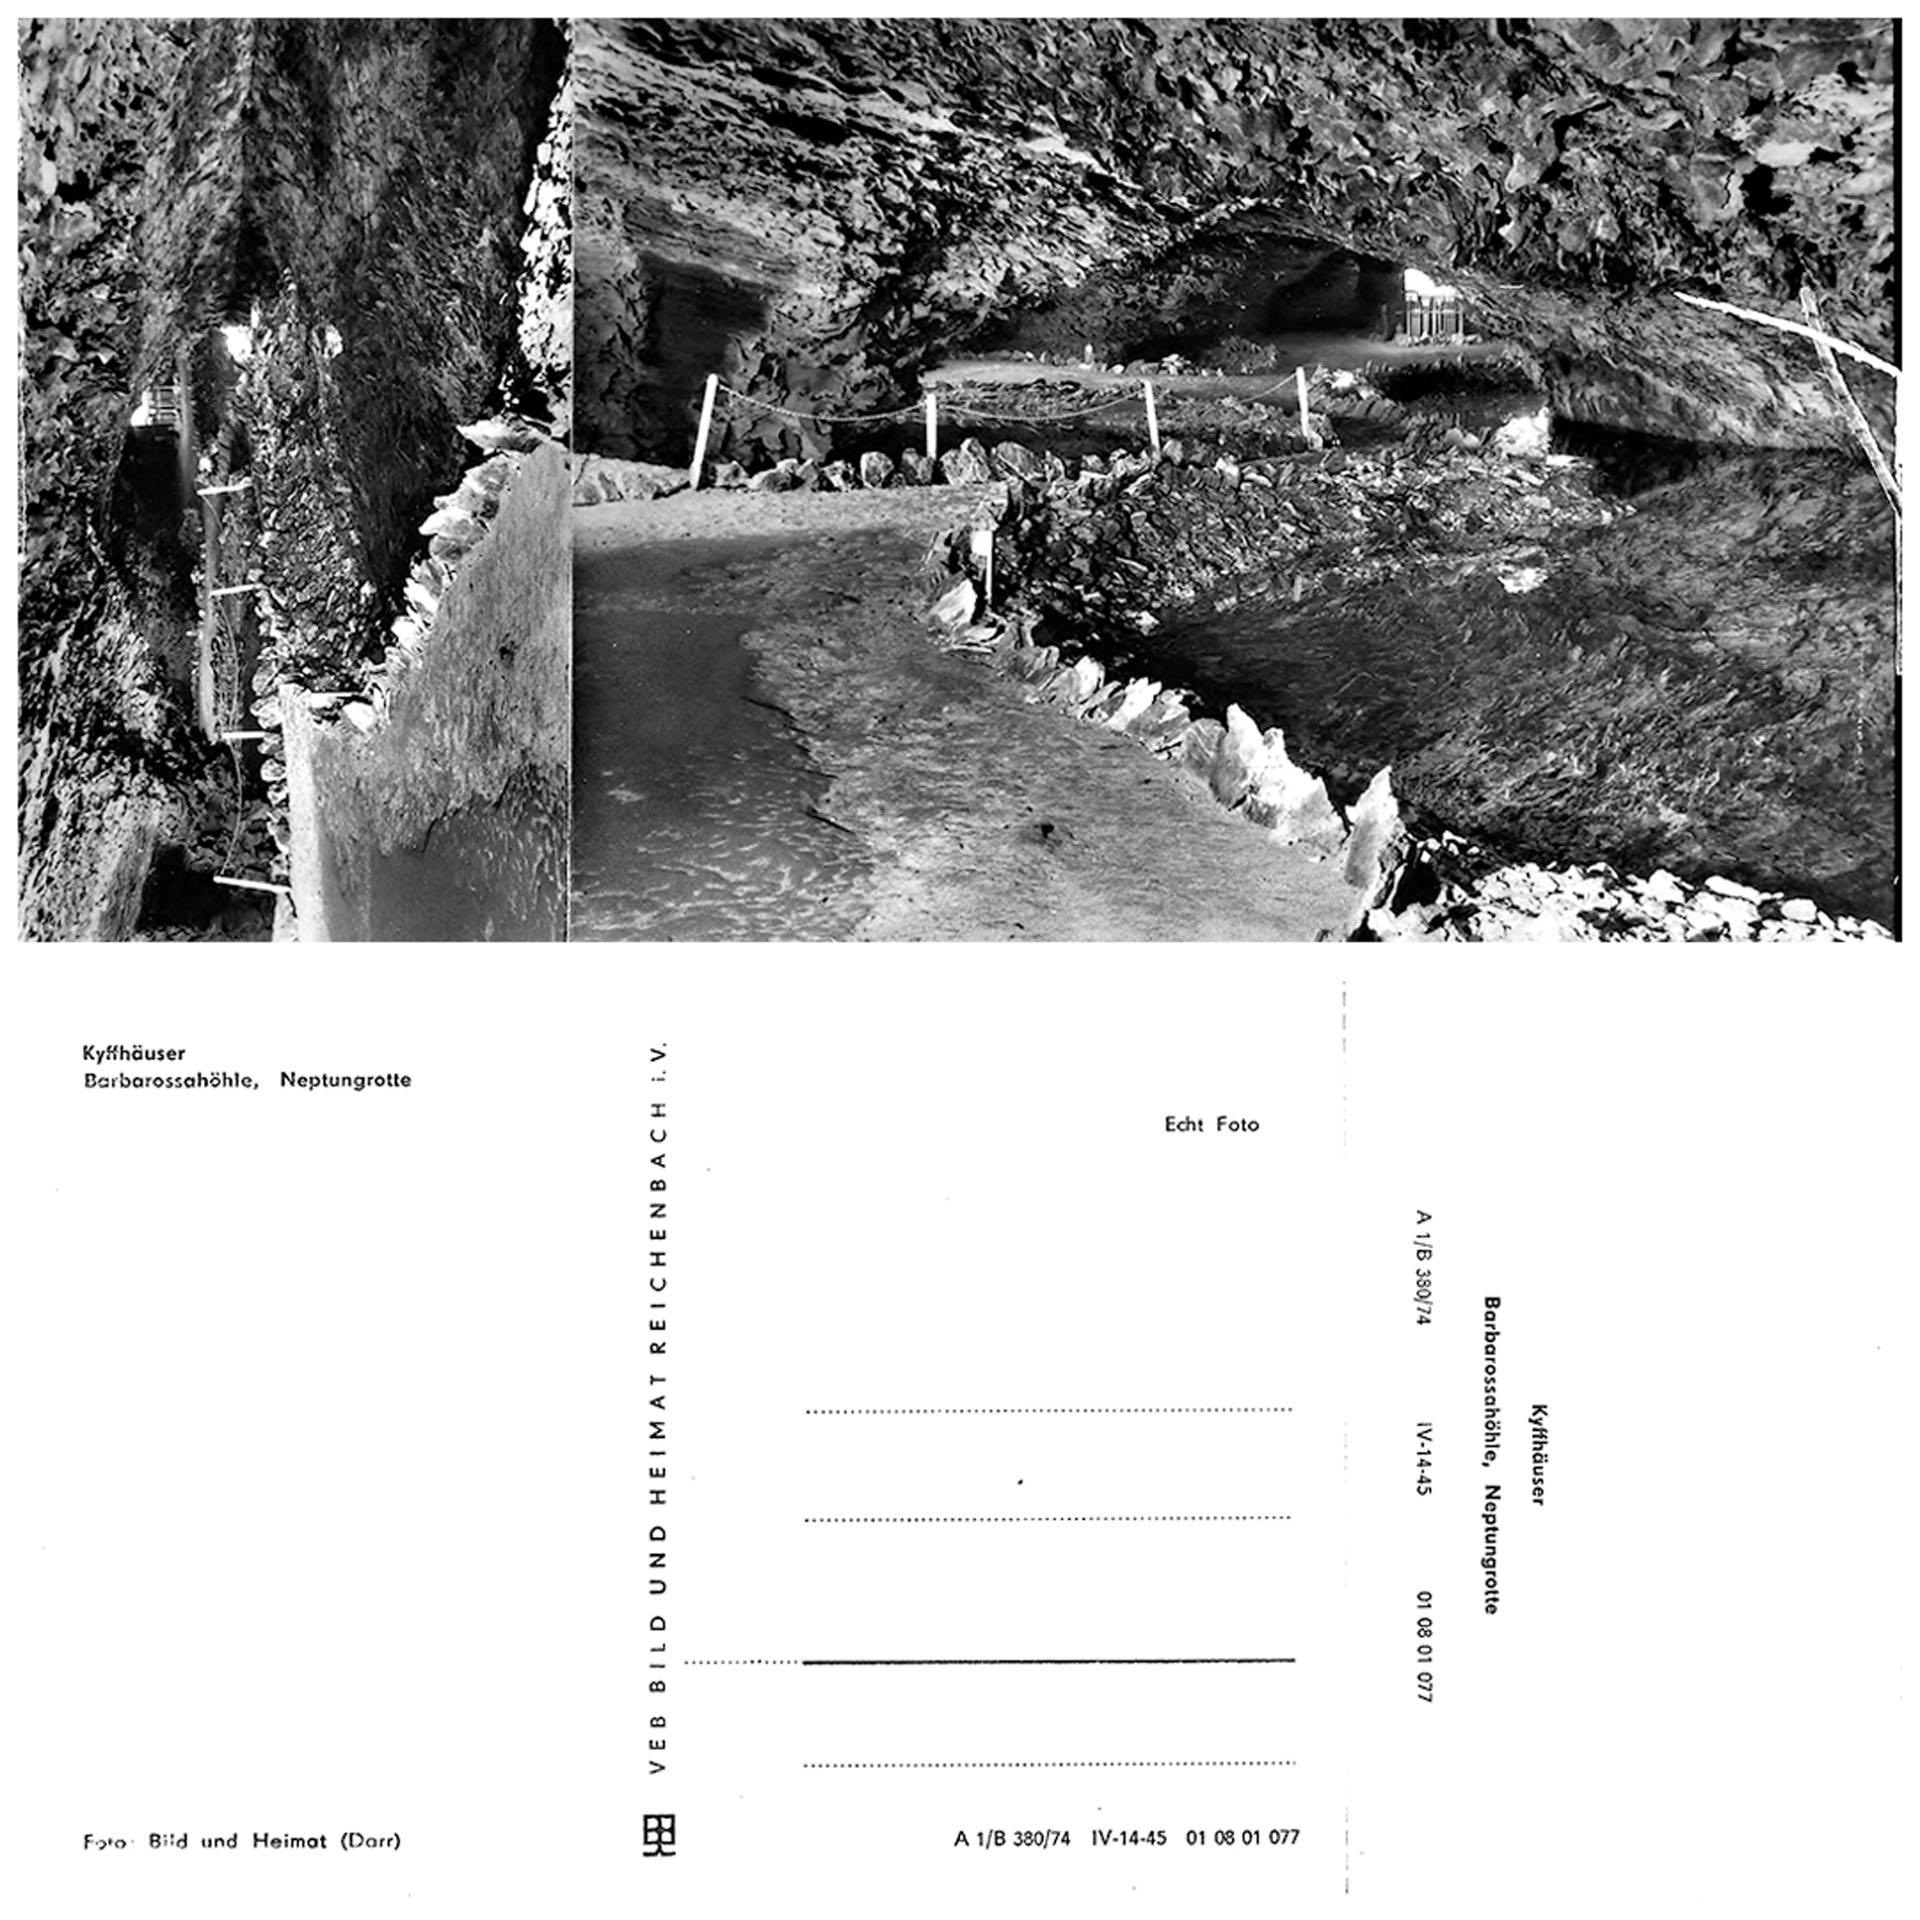 Kyffhäuser-Barbarossahöhle - Neptungrotte